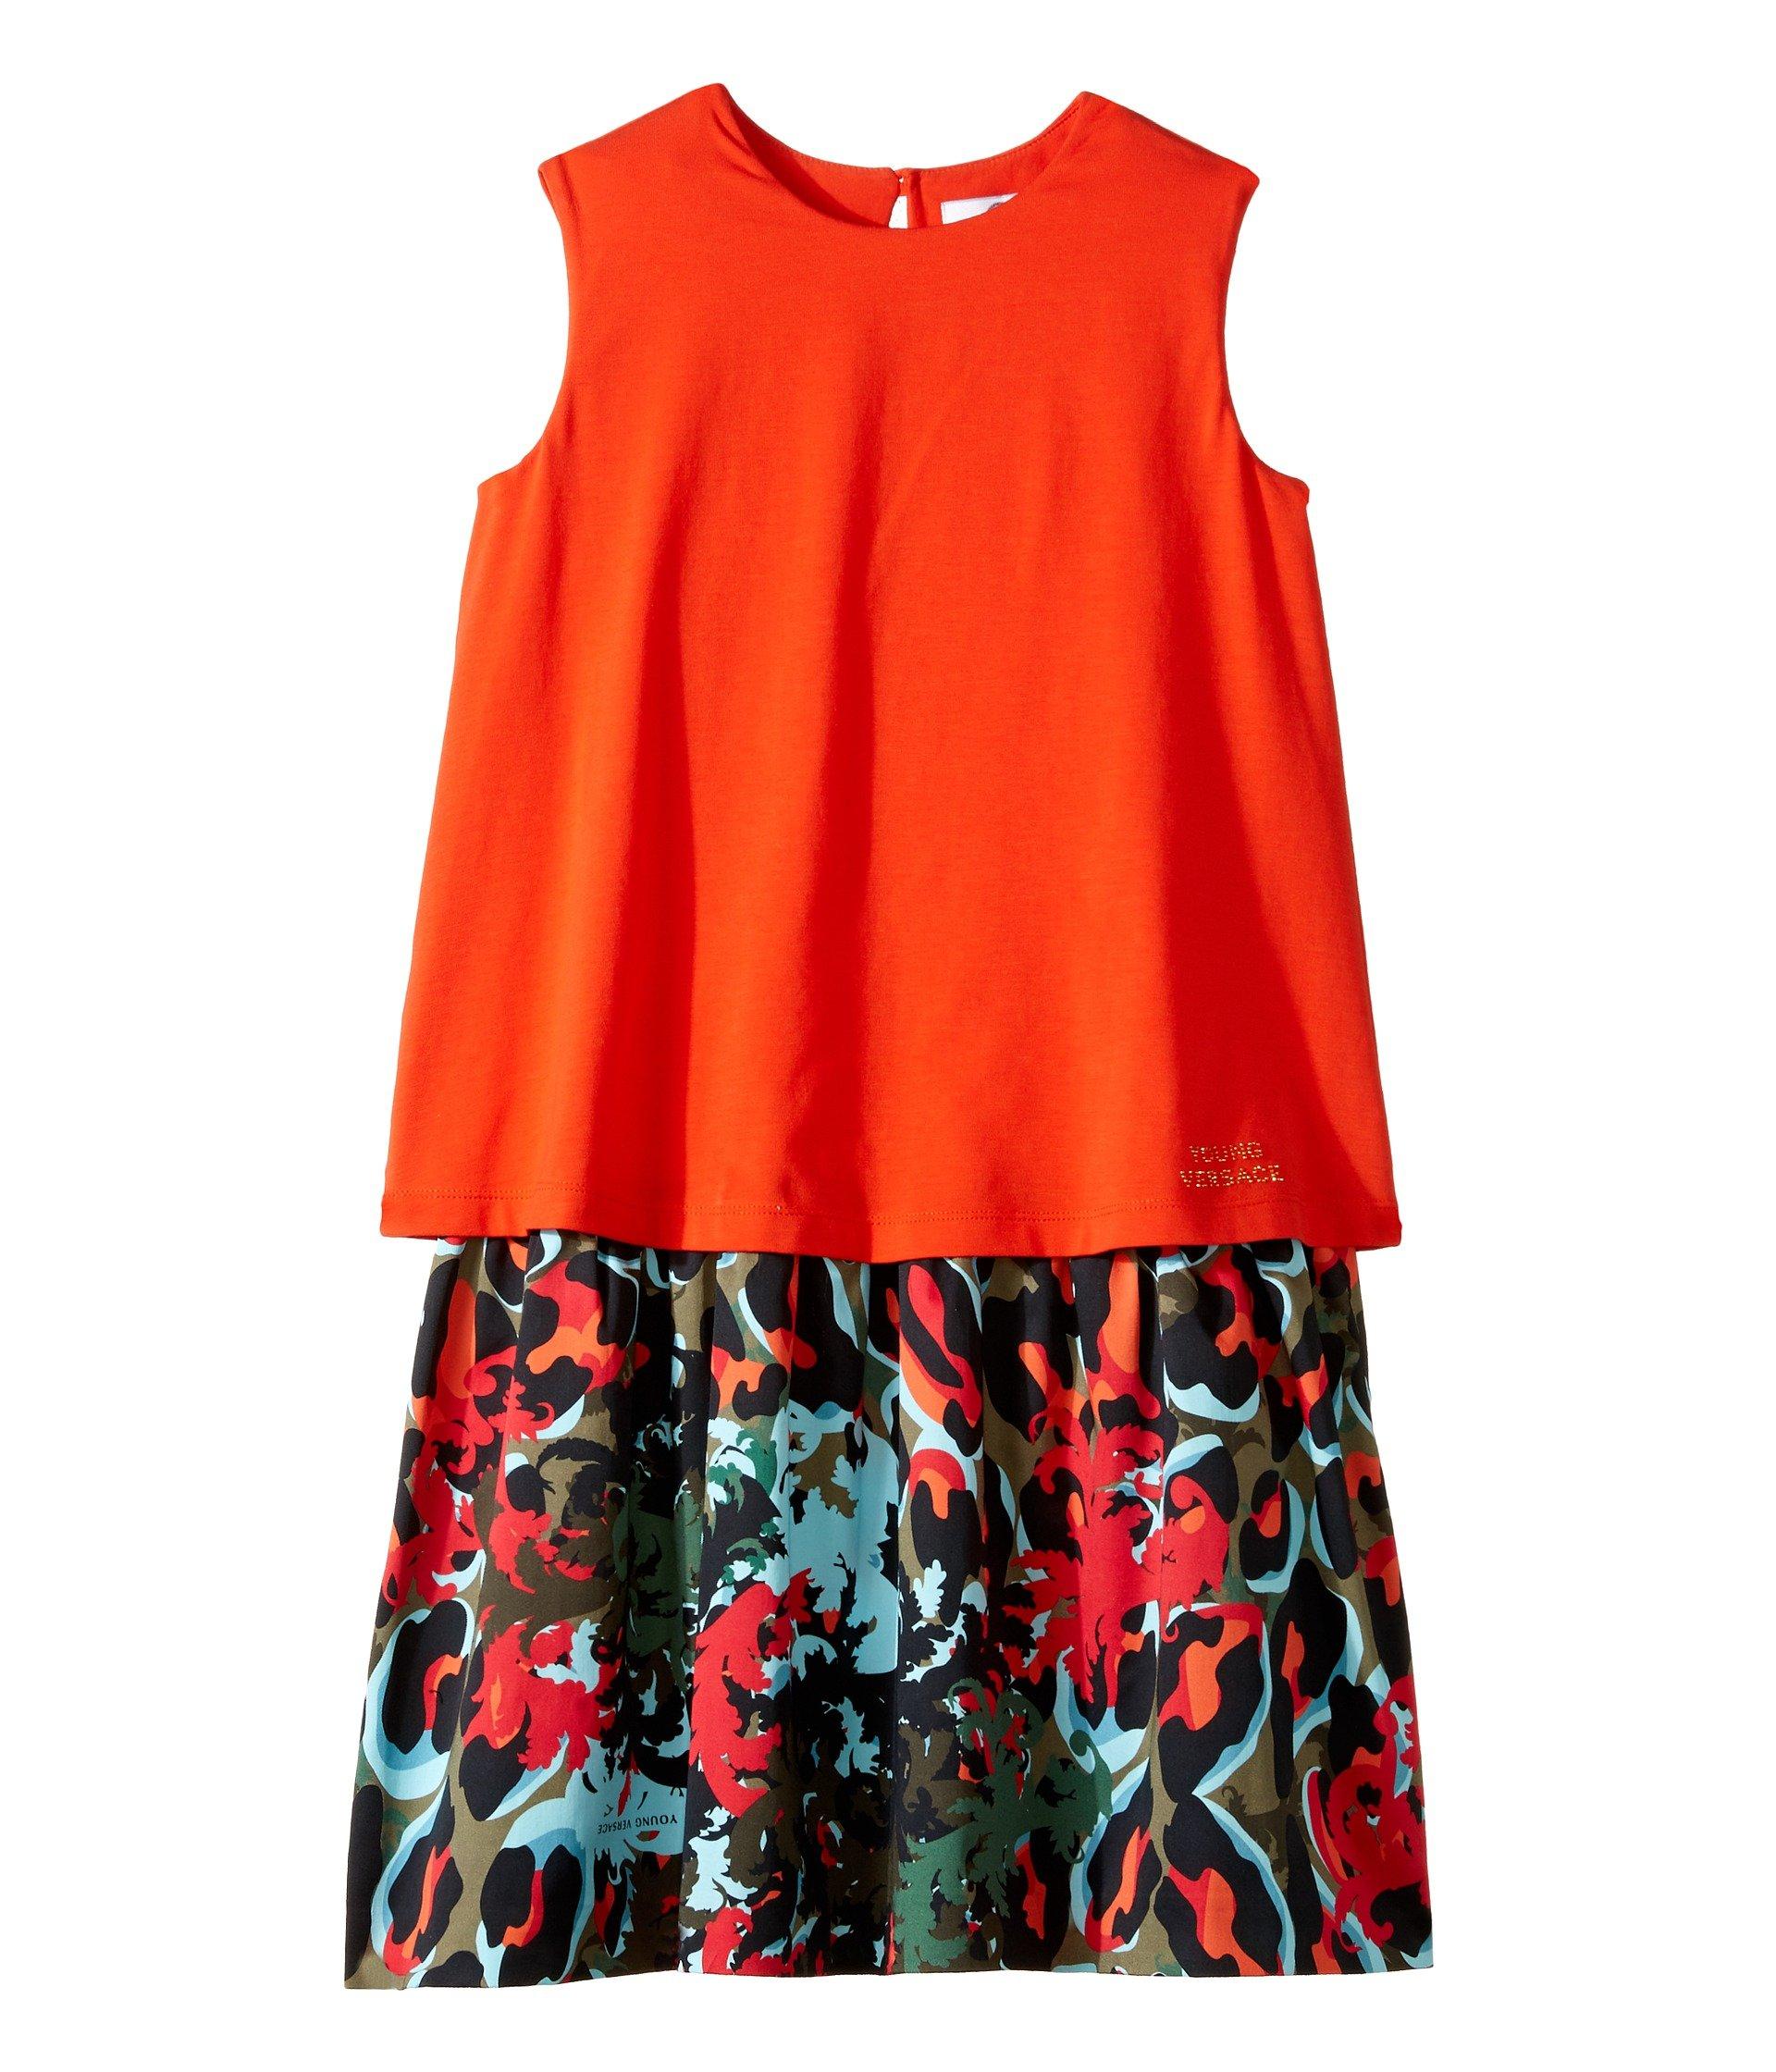 Vestido para Niña Versace Kids Layered Dress w/ Animal Print Skirt (Big Kids)  + Versace en VeoyCompro.net